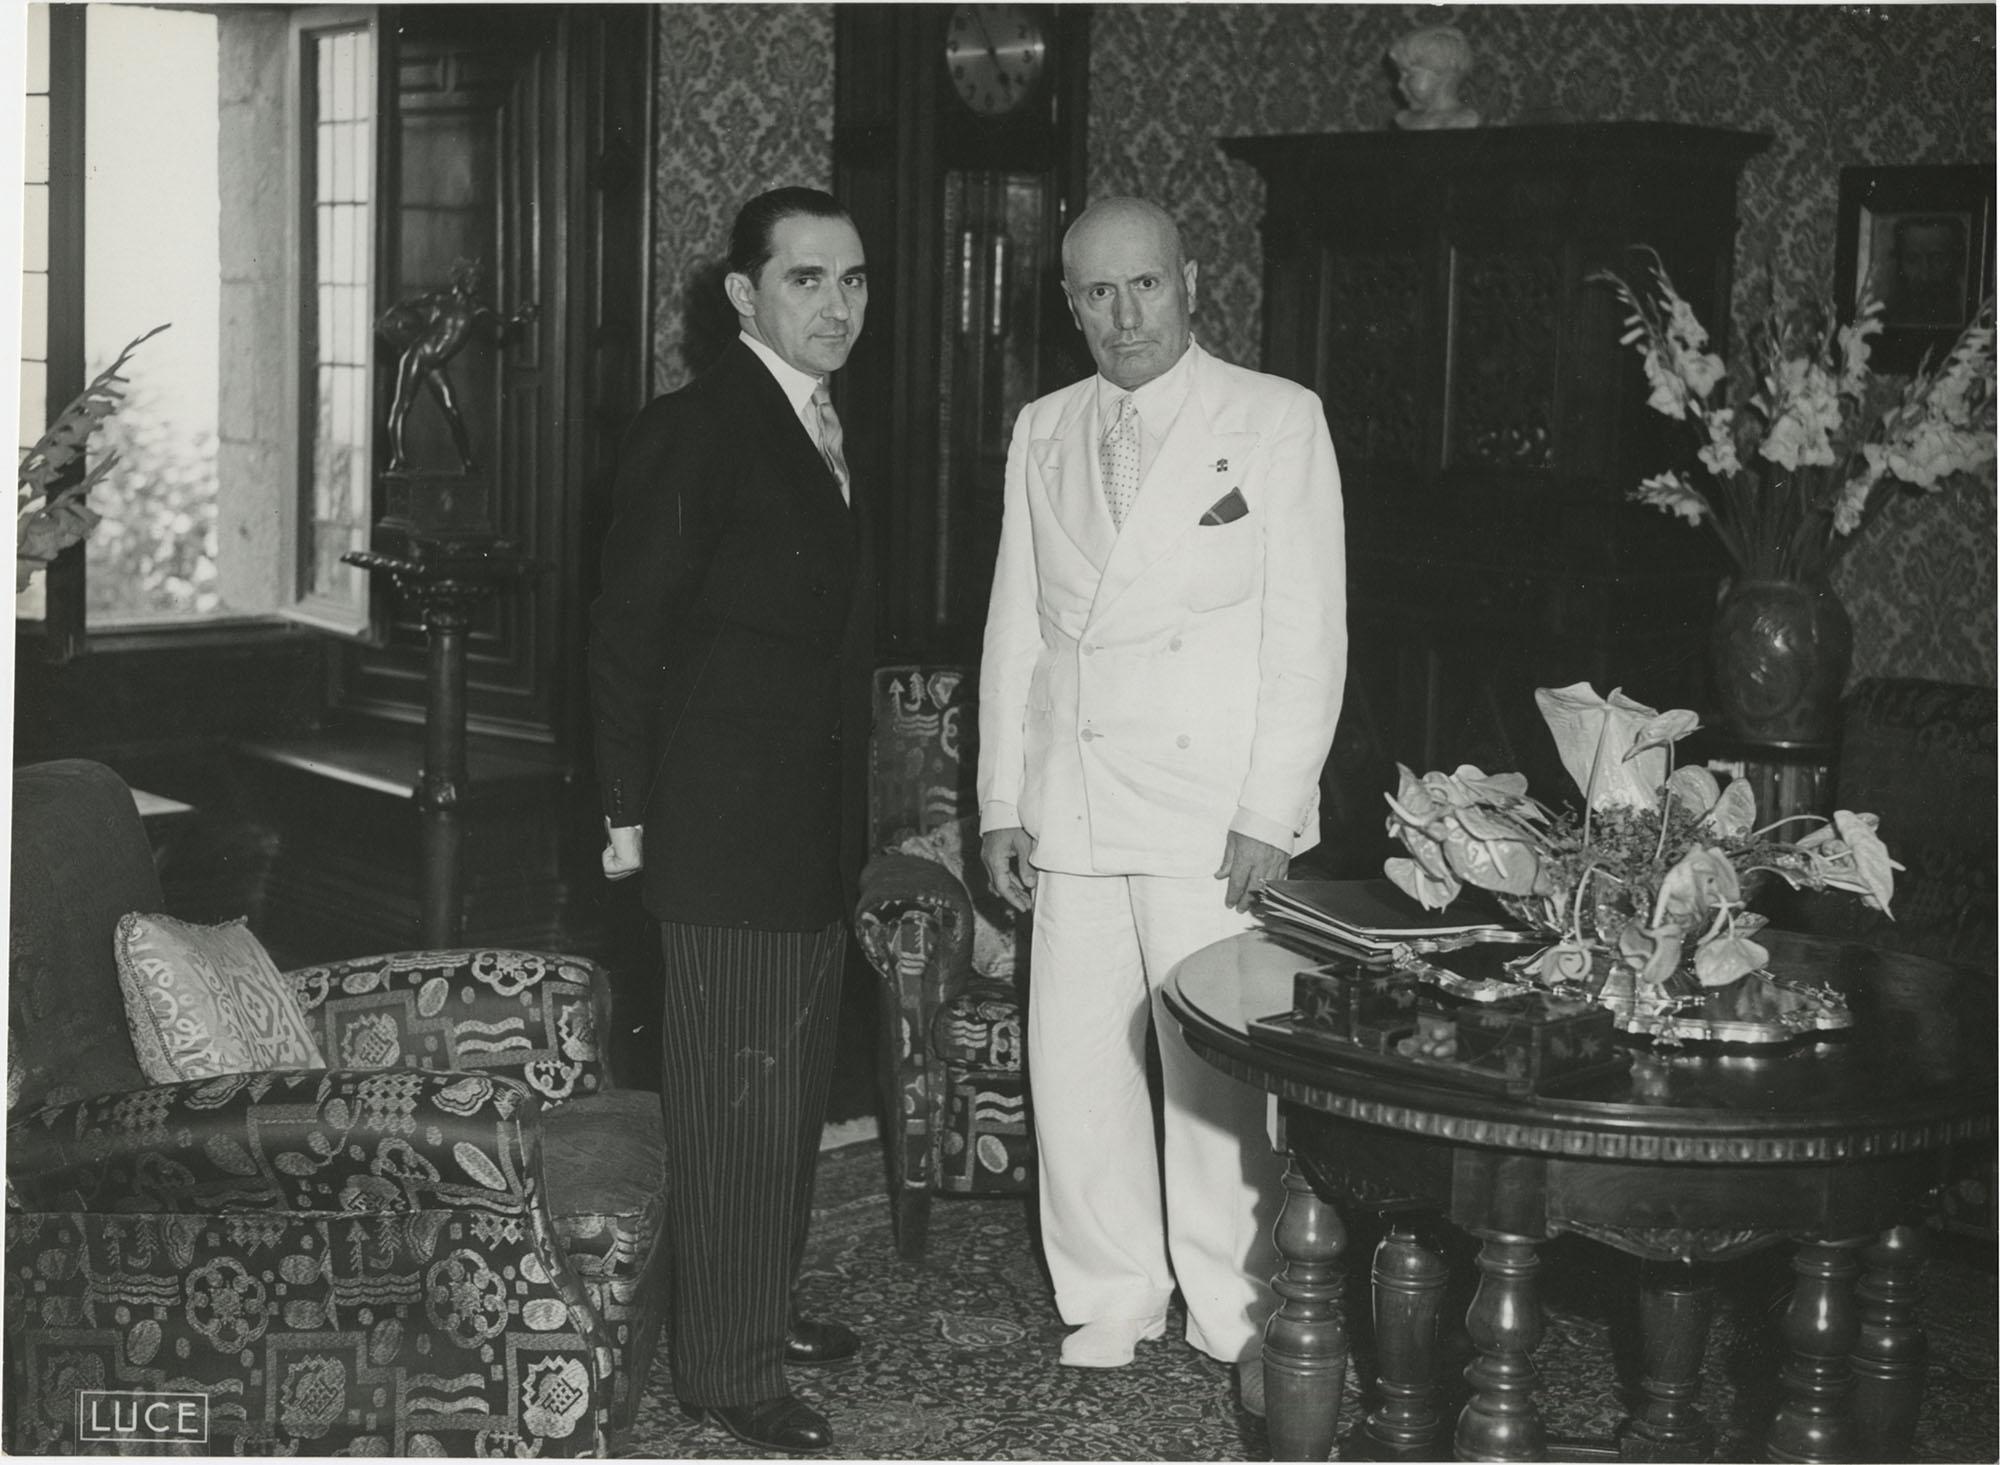 Mihai Antonescu's visit to Benito Mussolini, Photograph 35